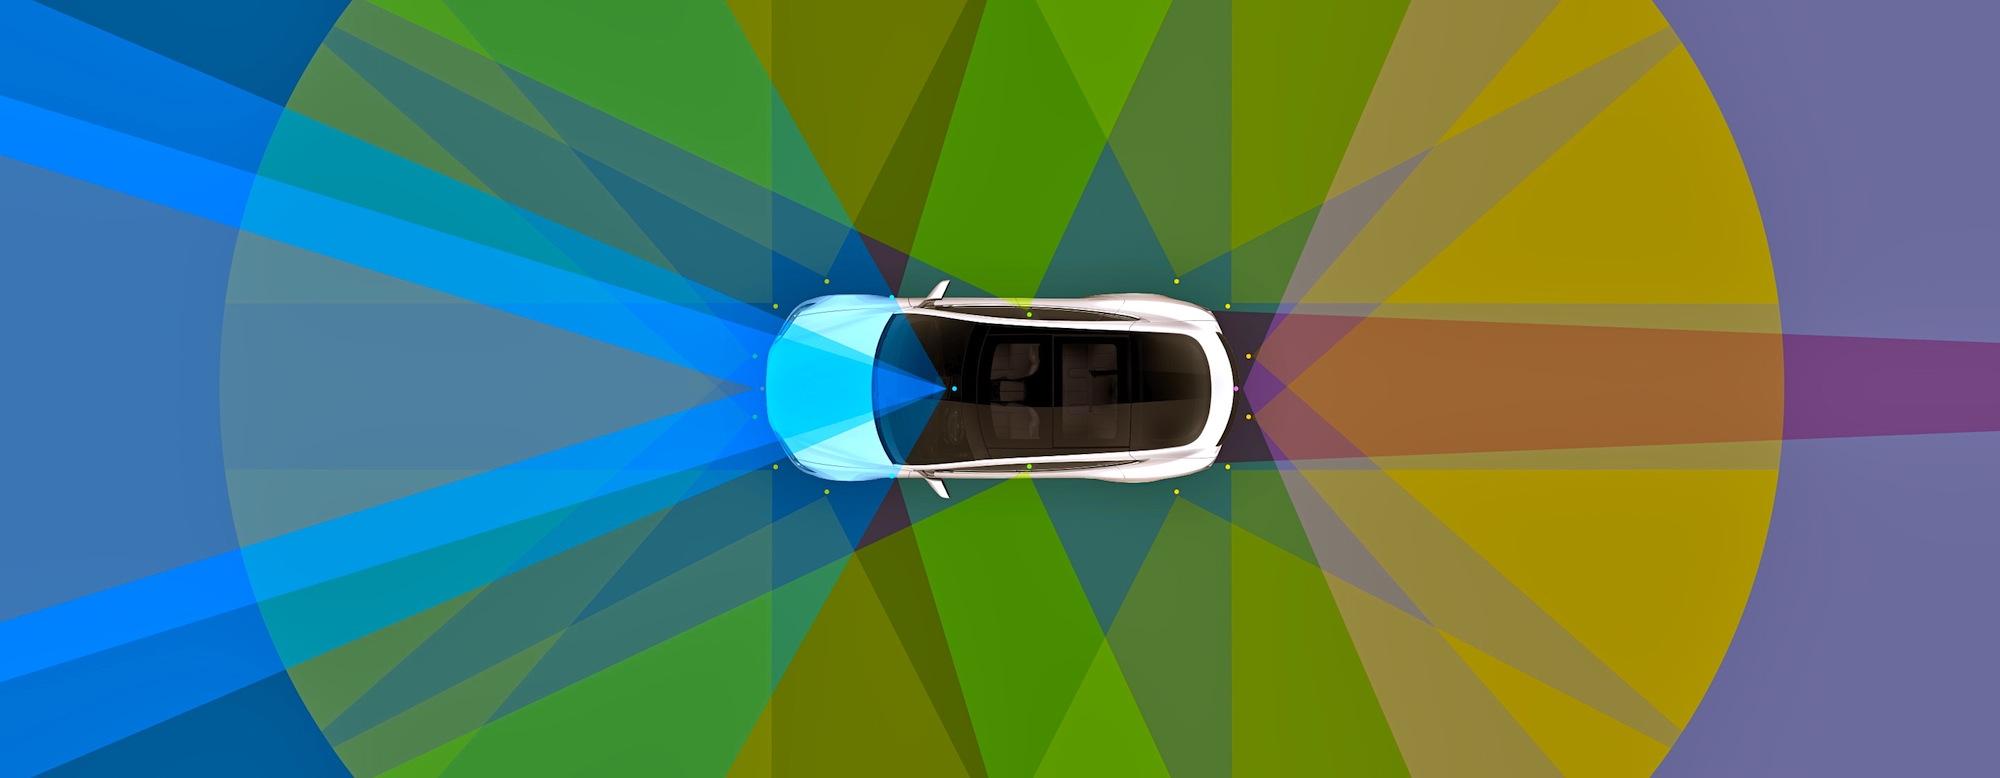 Tesla Autopilot: Self-Driving Servant Or Assisted Suicide?